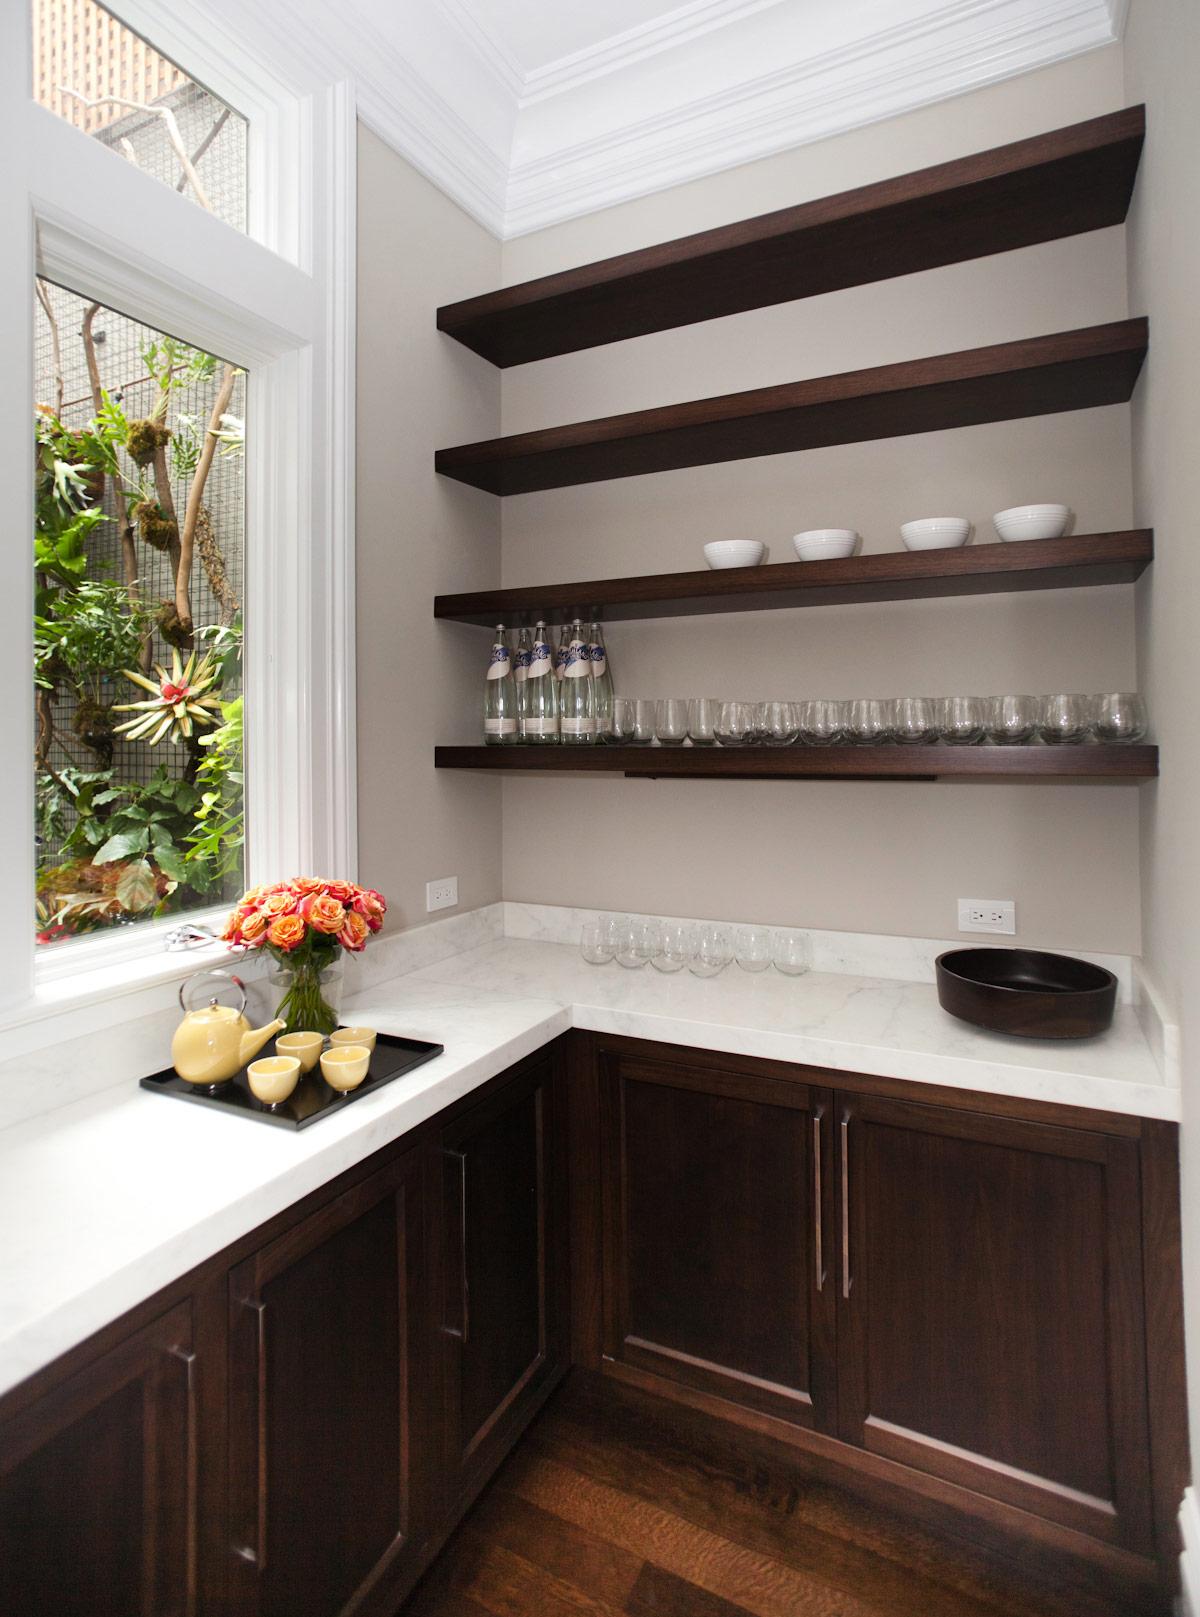 bar, cabinetry, door pulls, marble counters, garden wall, hanging plant wall, floating shelves, hardwood floors